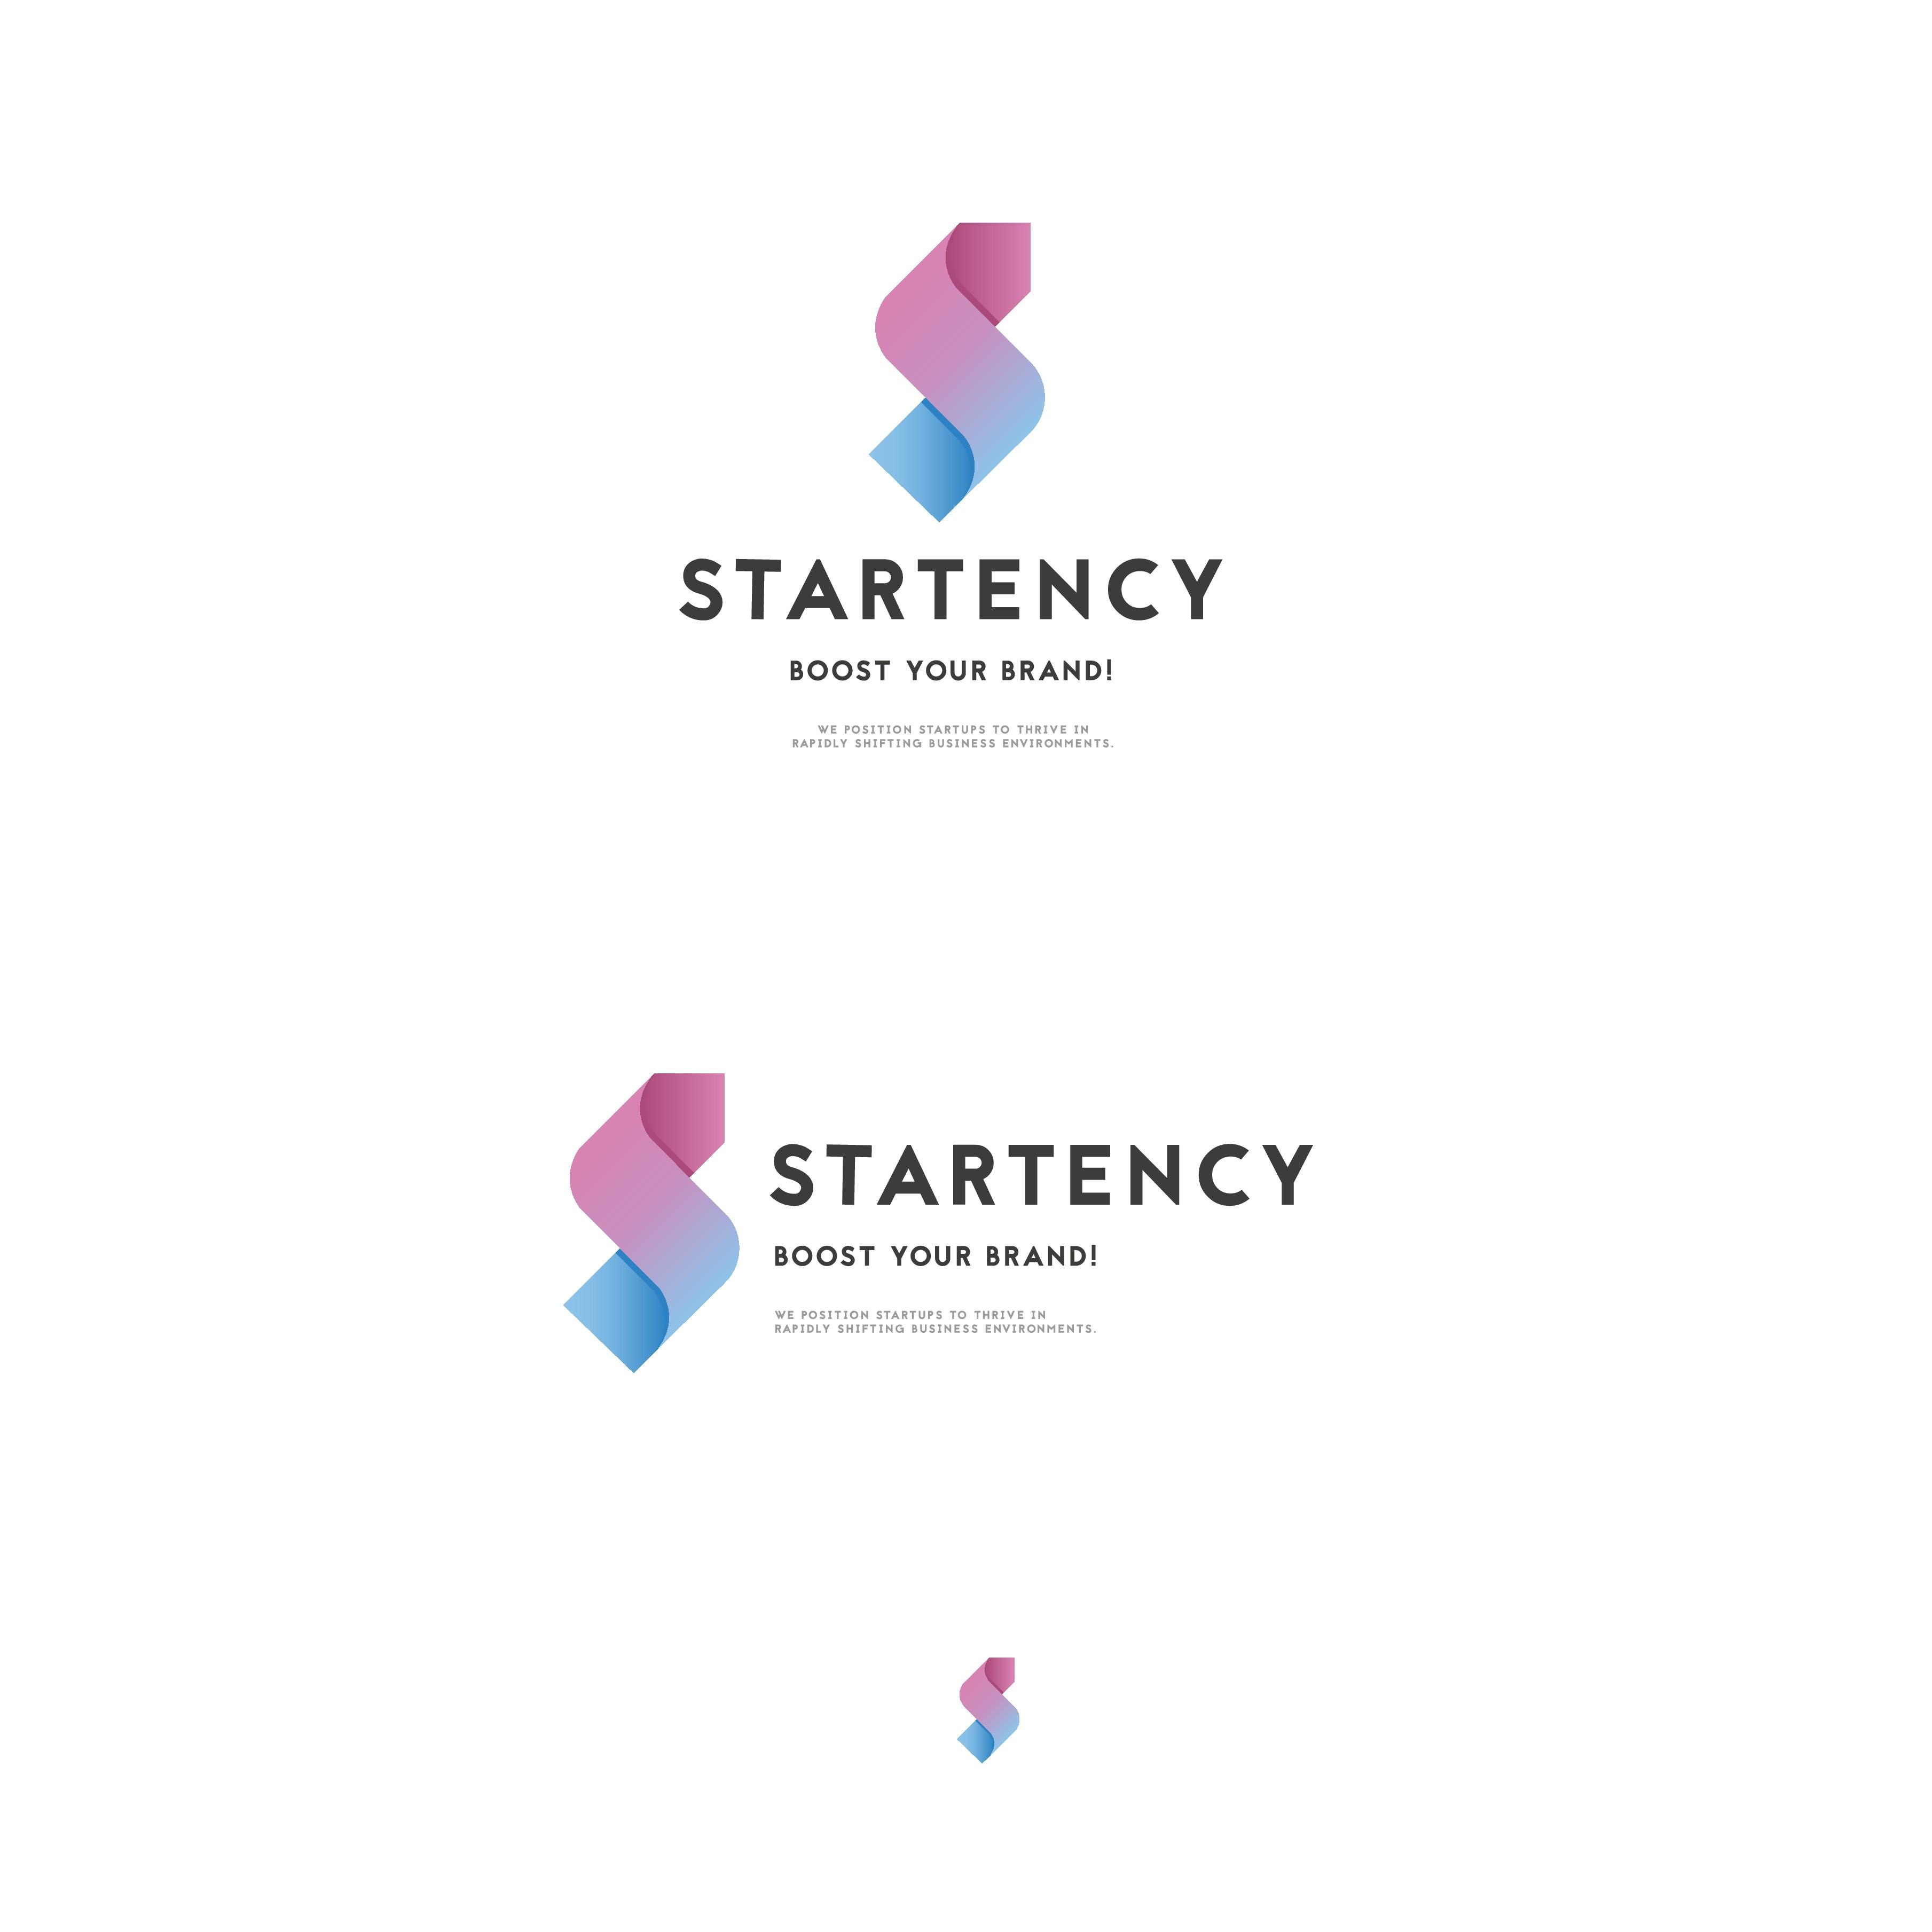 Need very modern, sophisticated logo design